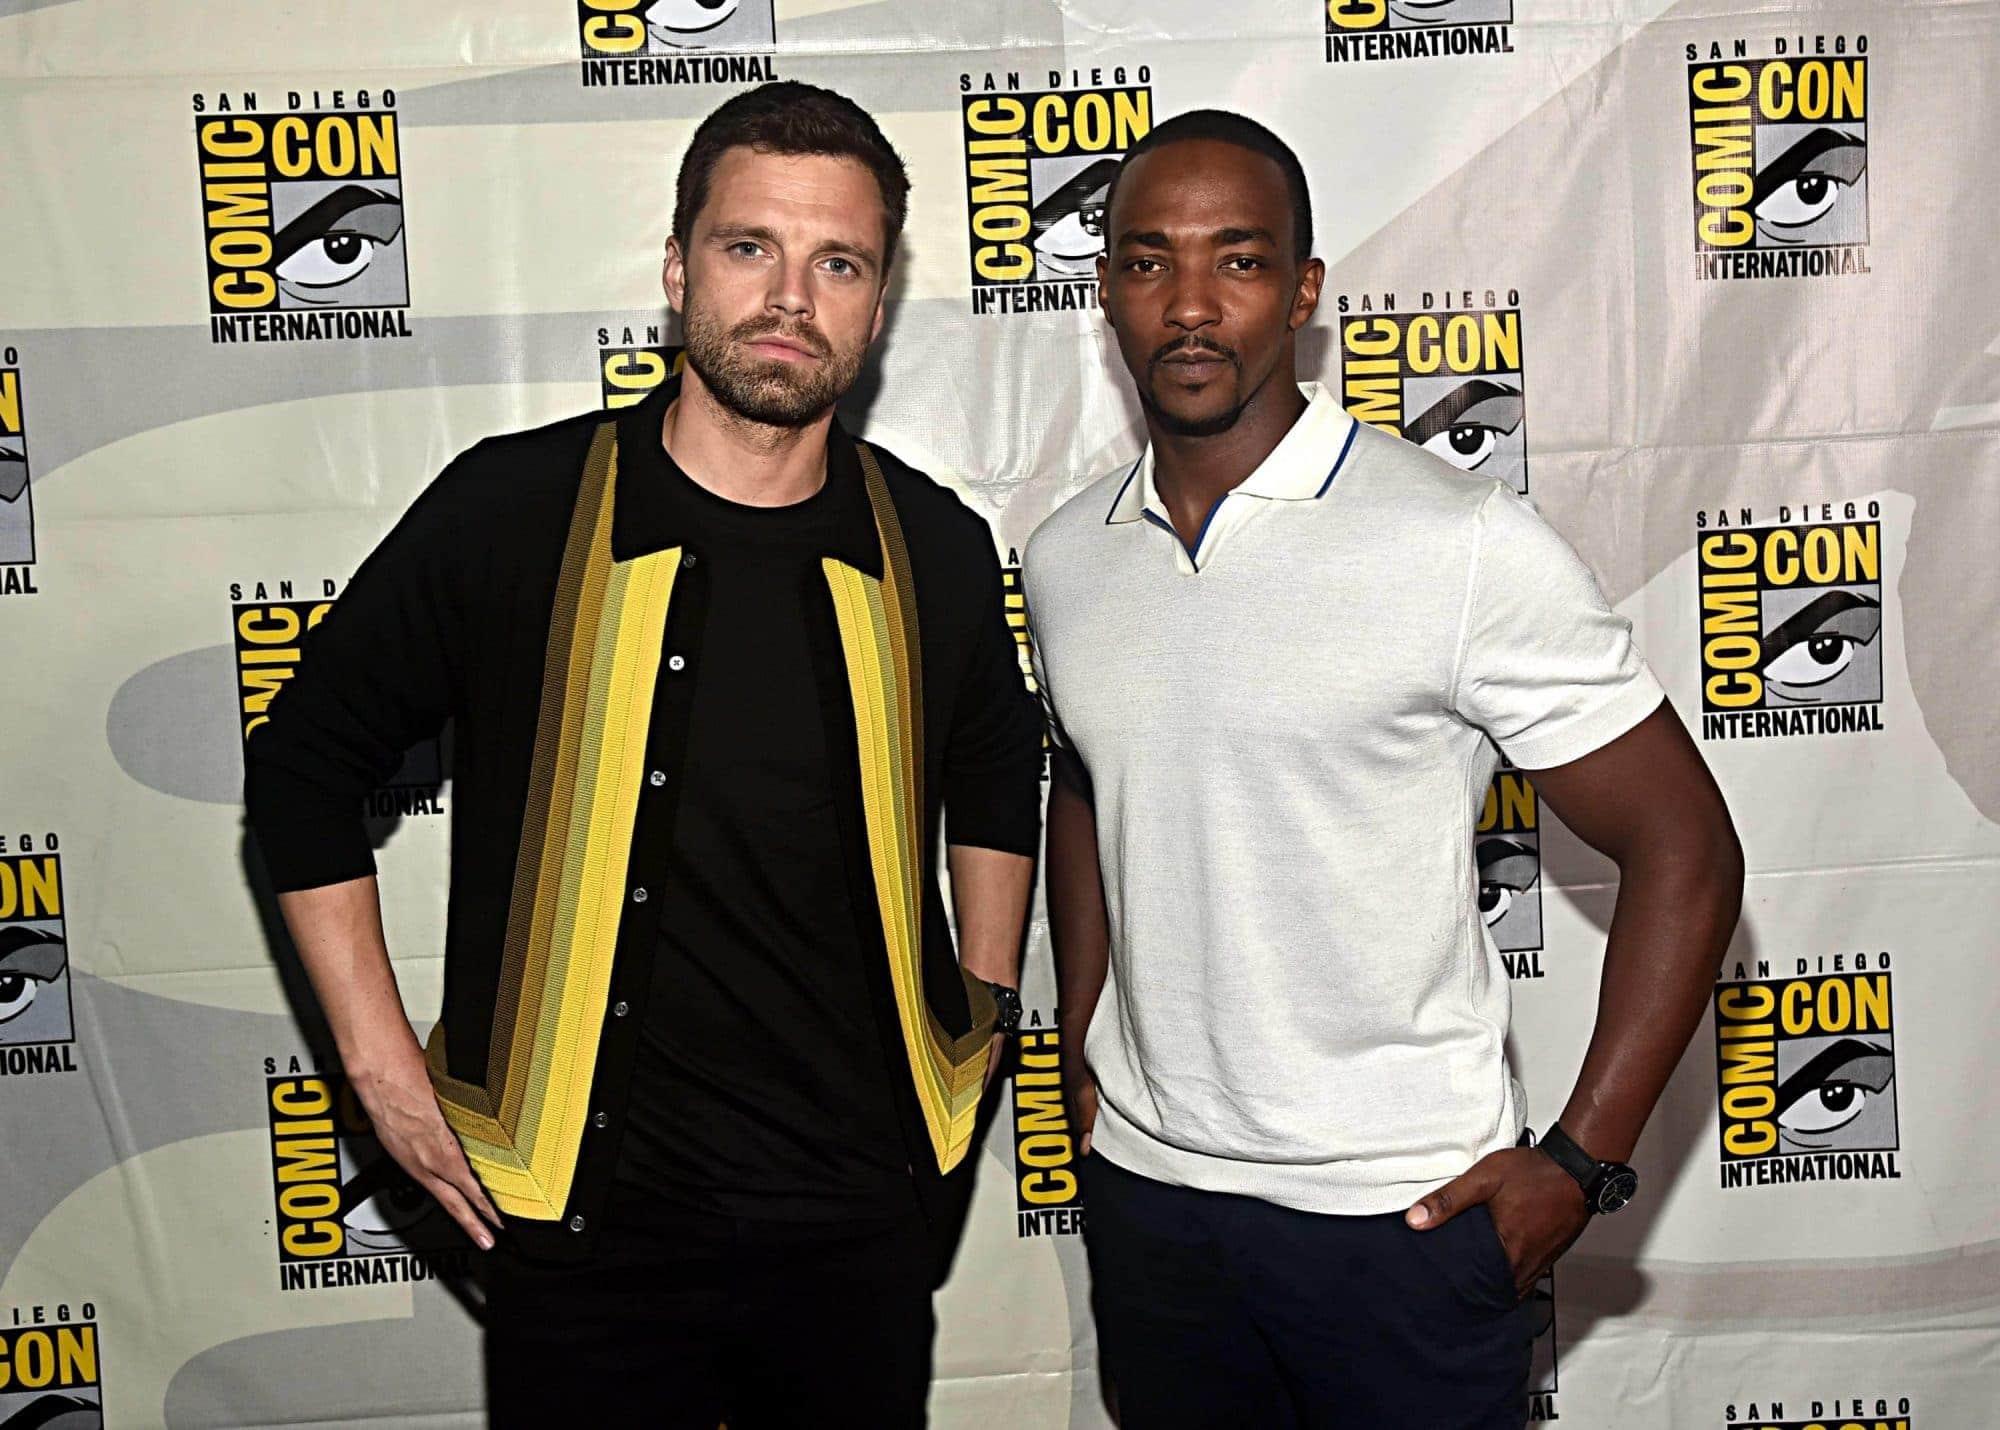 Marvel Studios ประกาศรายชื่อภาพยนตร์และซีรีส์ที่เตรียมสานต่อเรื่องราวใน Phase 4 ของ Marvel Cinematic Universe มากกว่า 10 เรื่อง 22